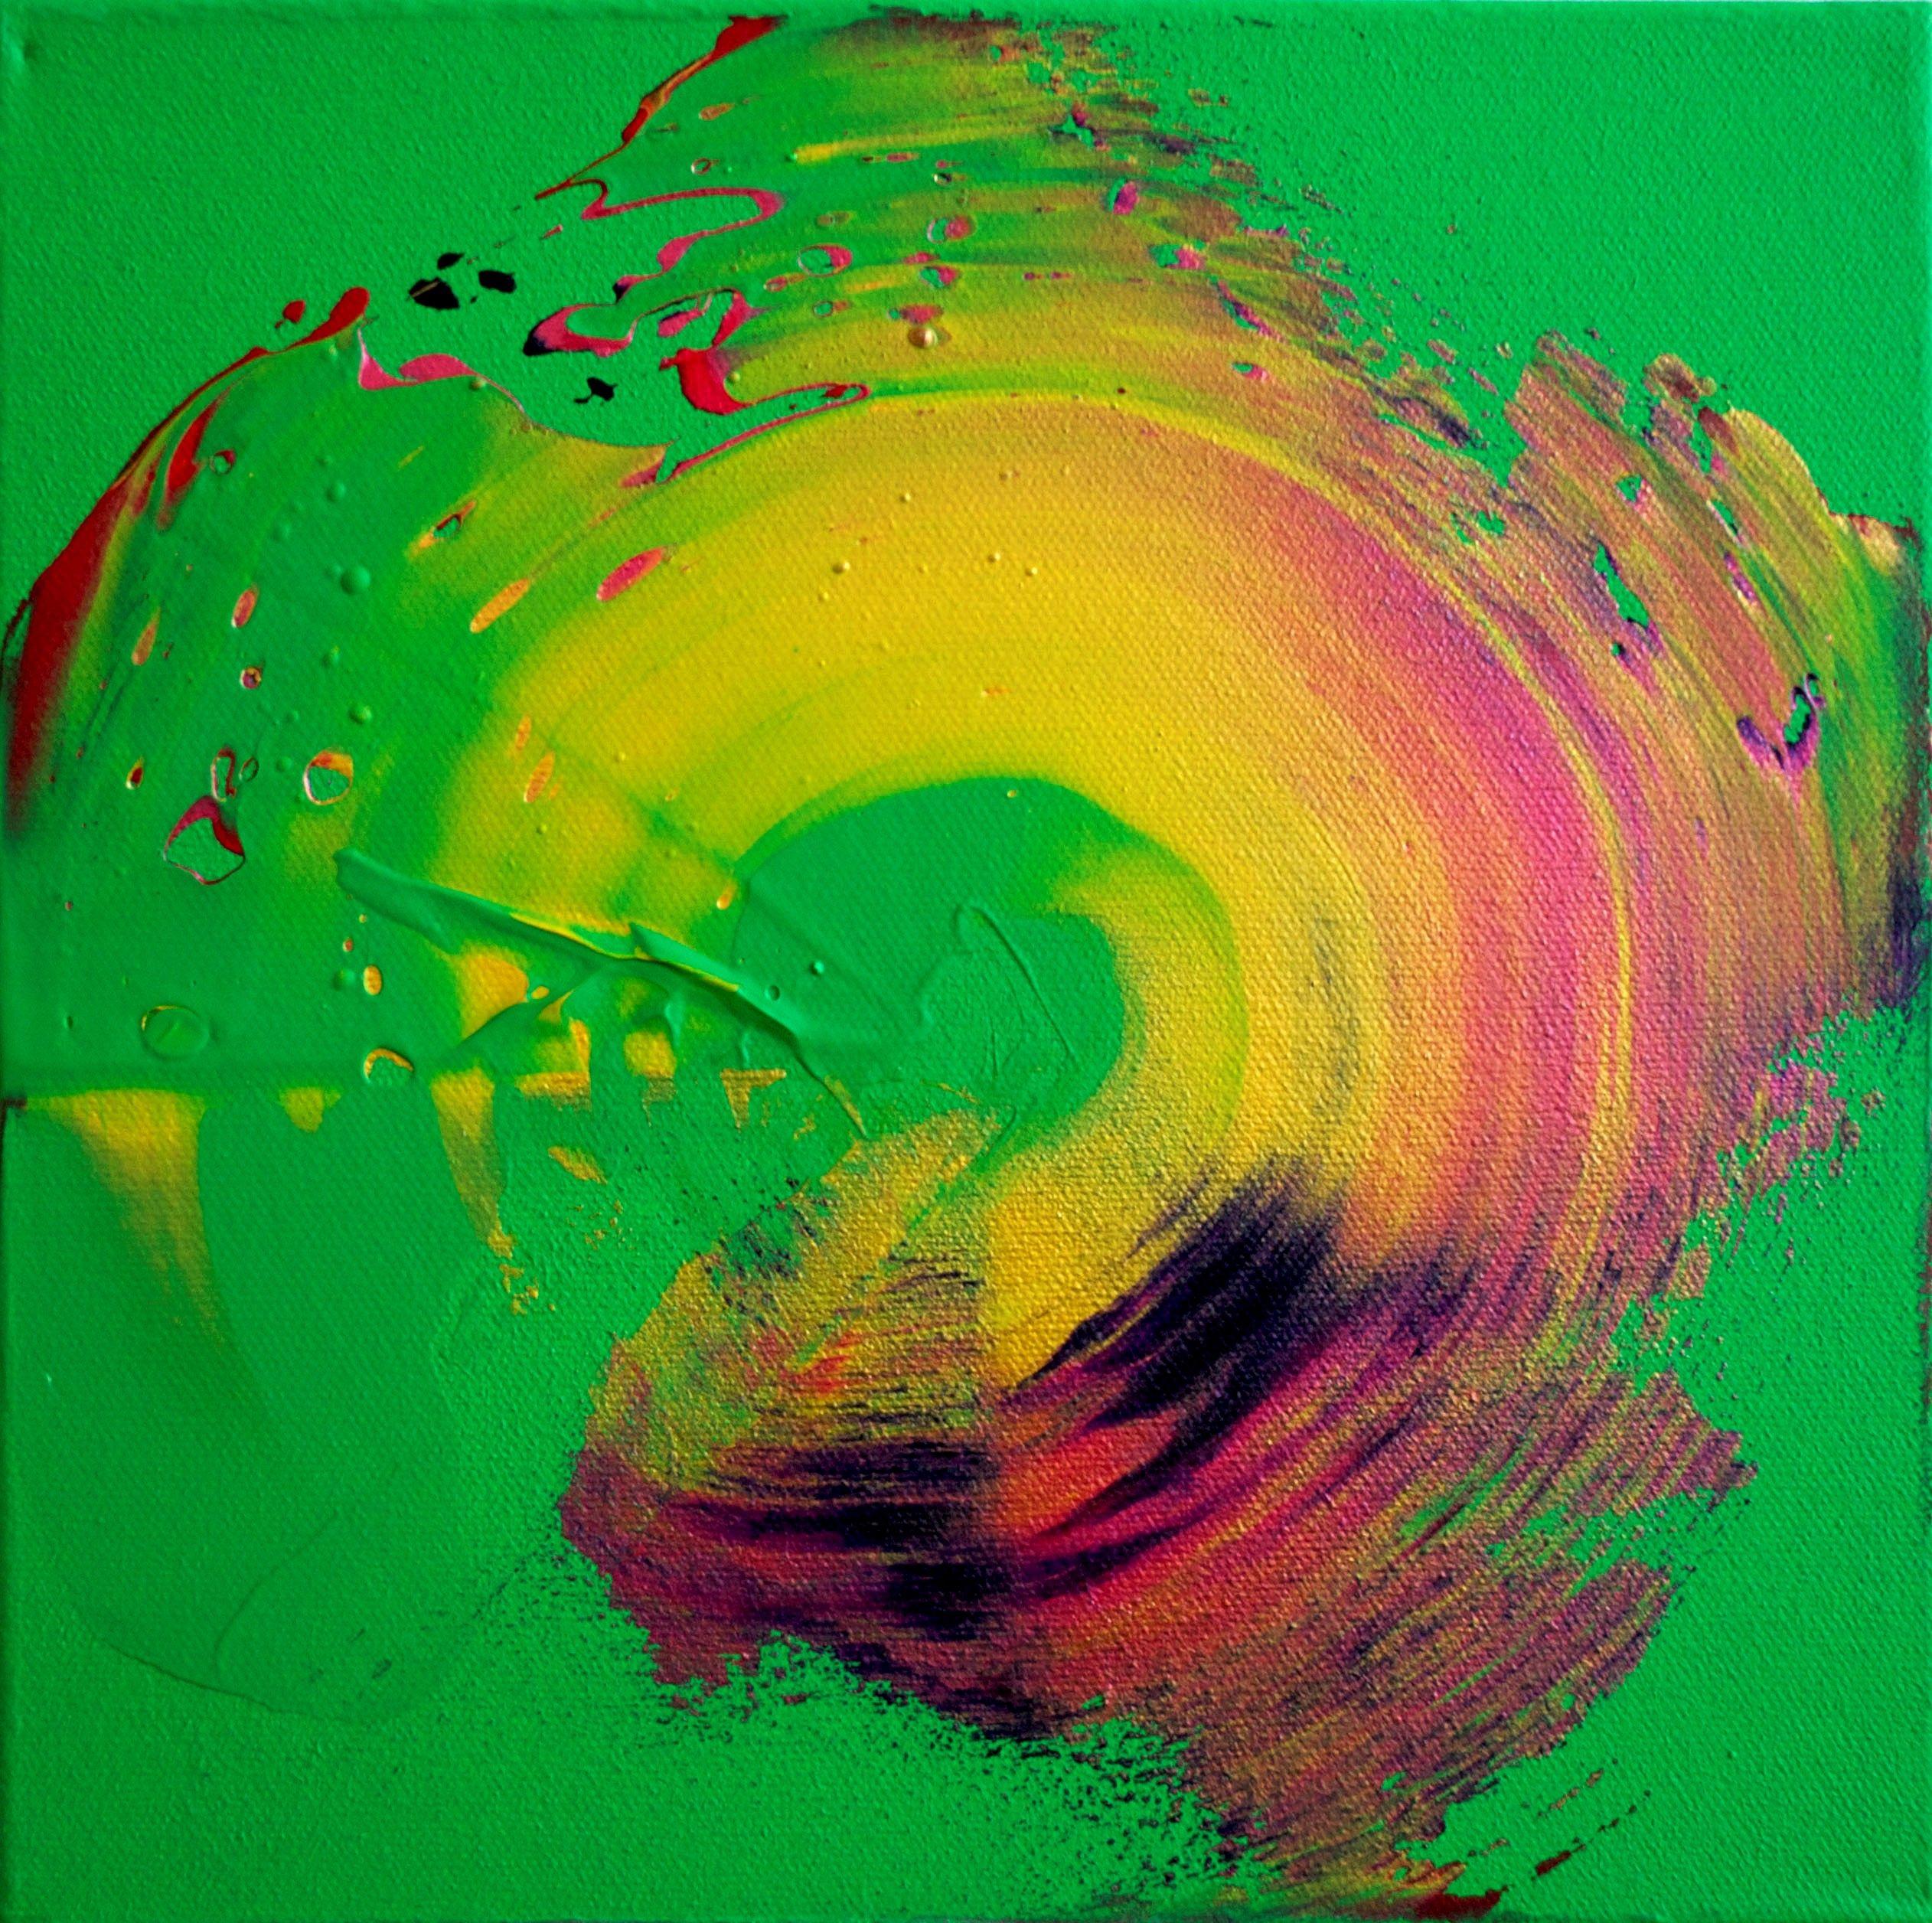 Isabelle Beaubien, Visual Artist 'Movement 117' www